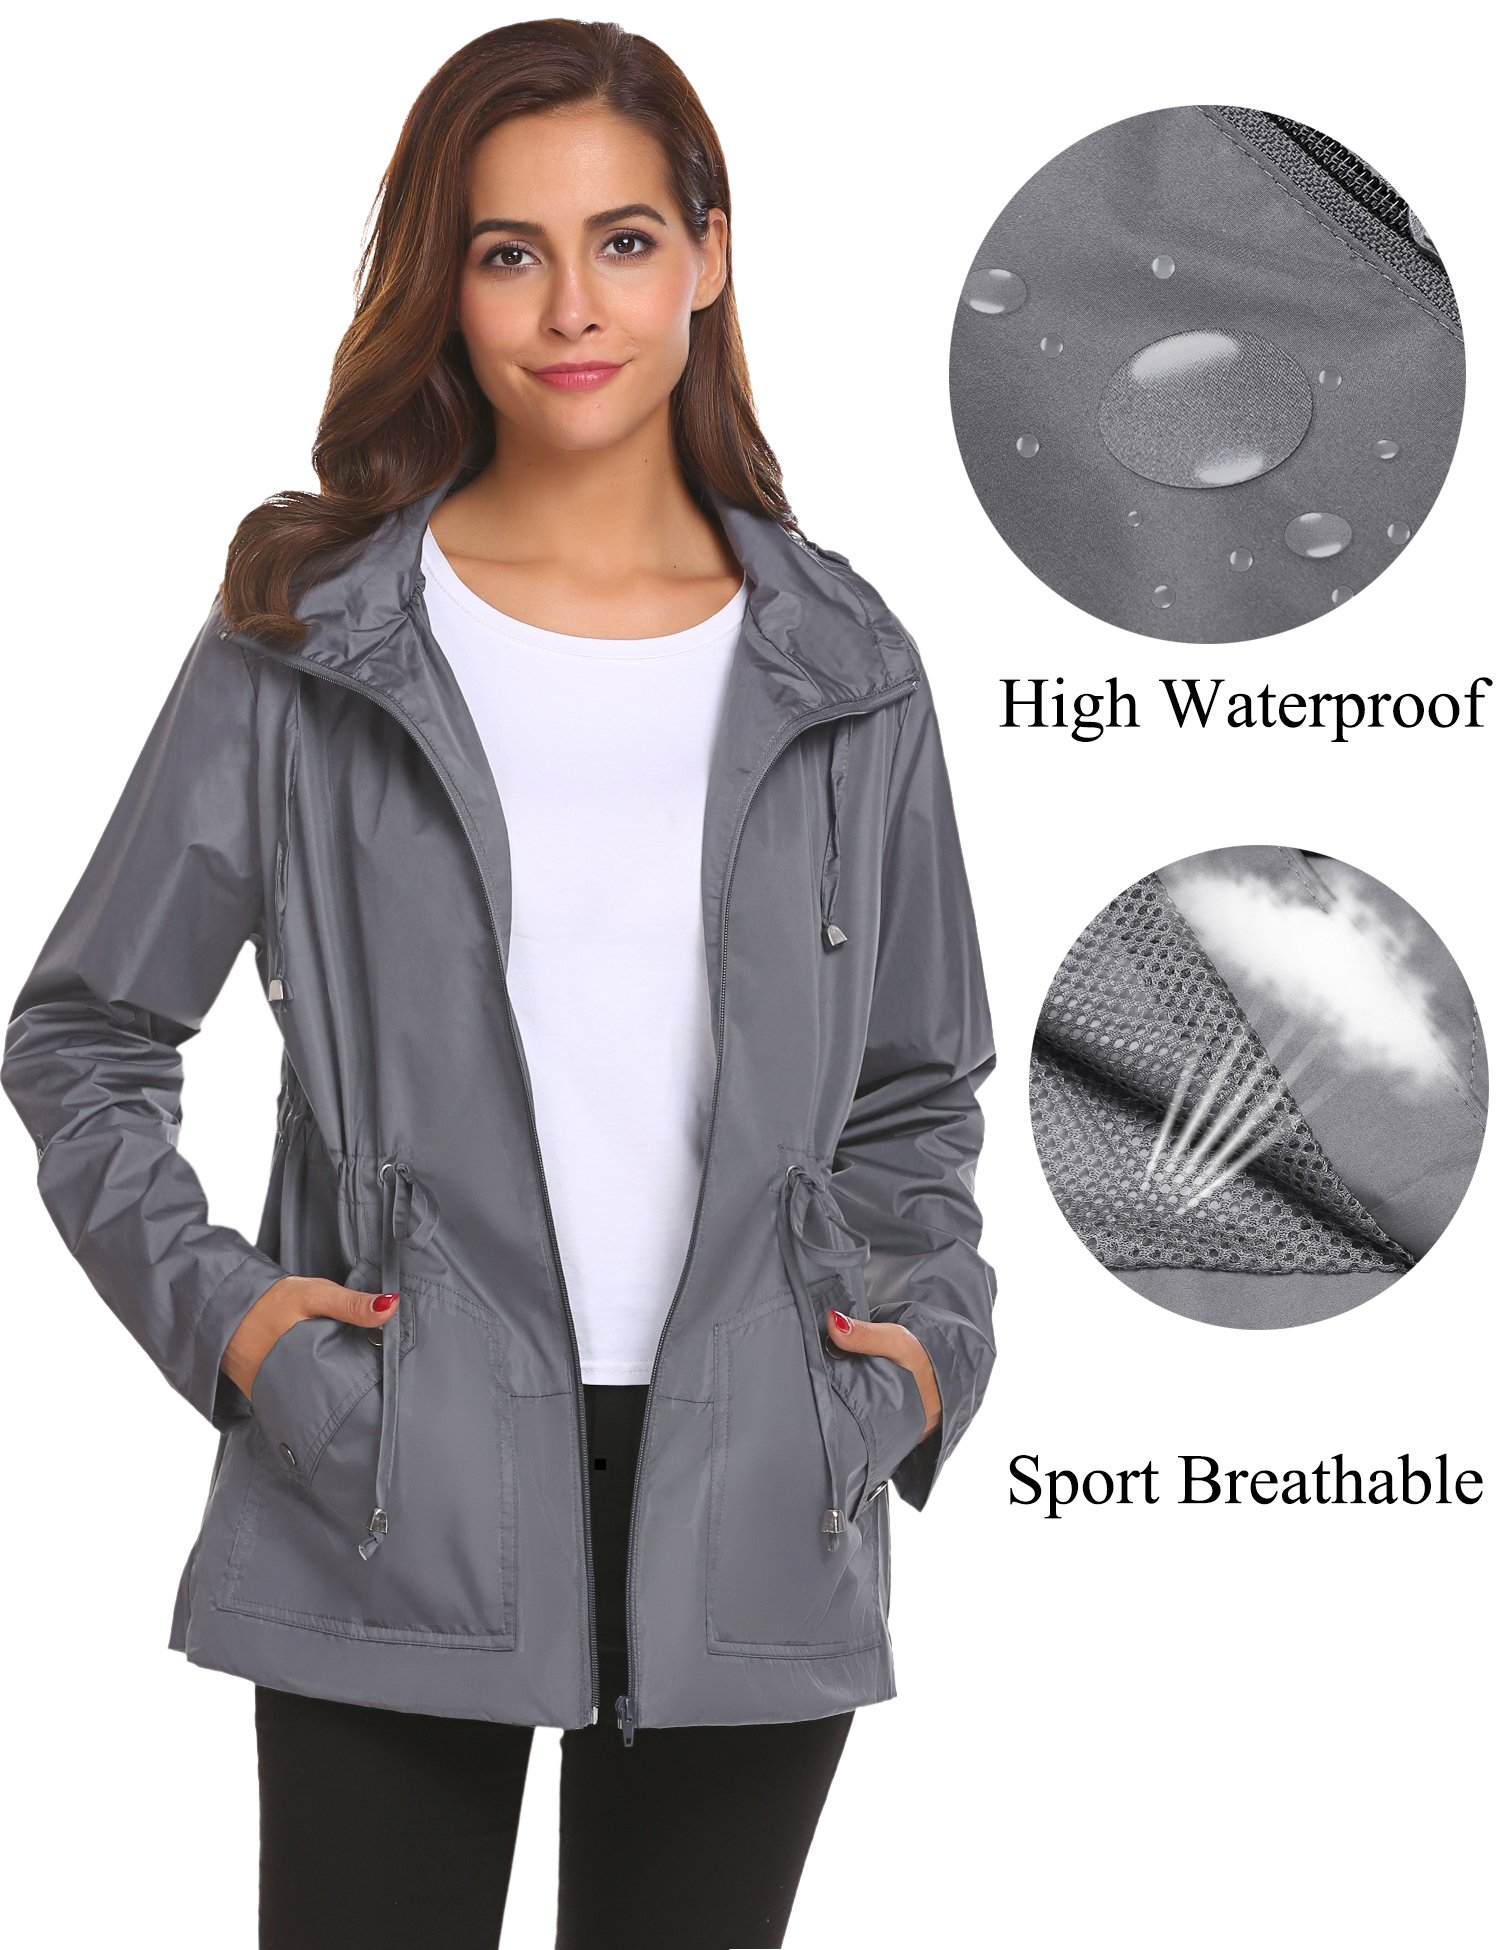 8e7eab1c76b1 Best Rated in Women s Raincoats   Helpful Customer Reviews - Amazon.com